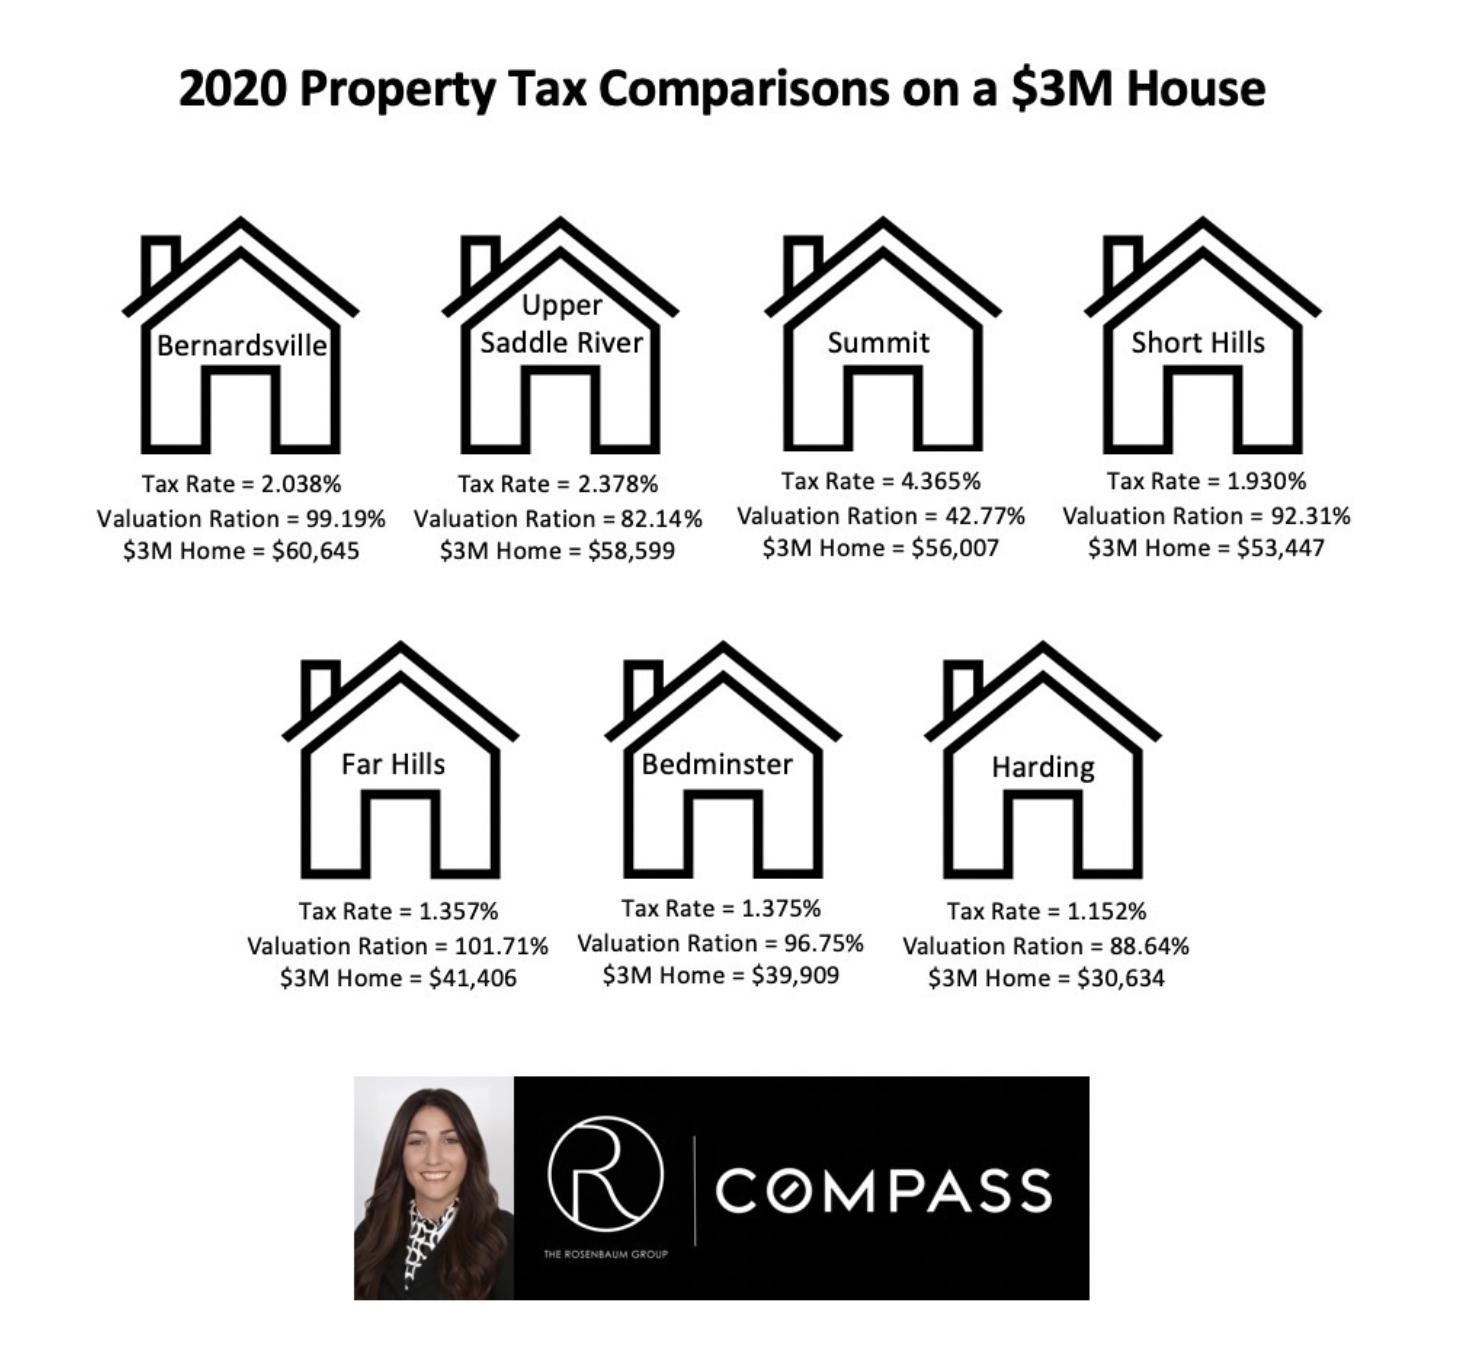 Real Estate Blog: 2020 Property Tax Comparisons